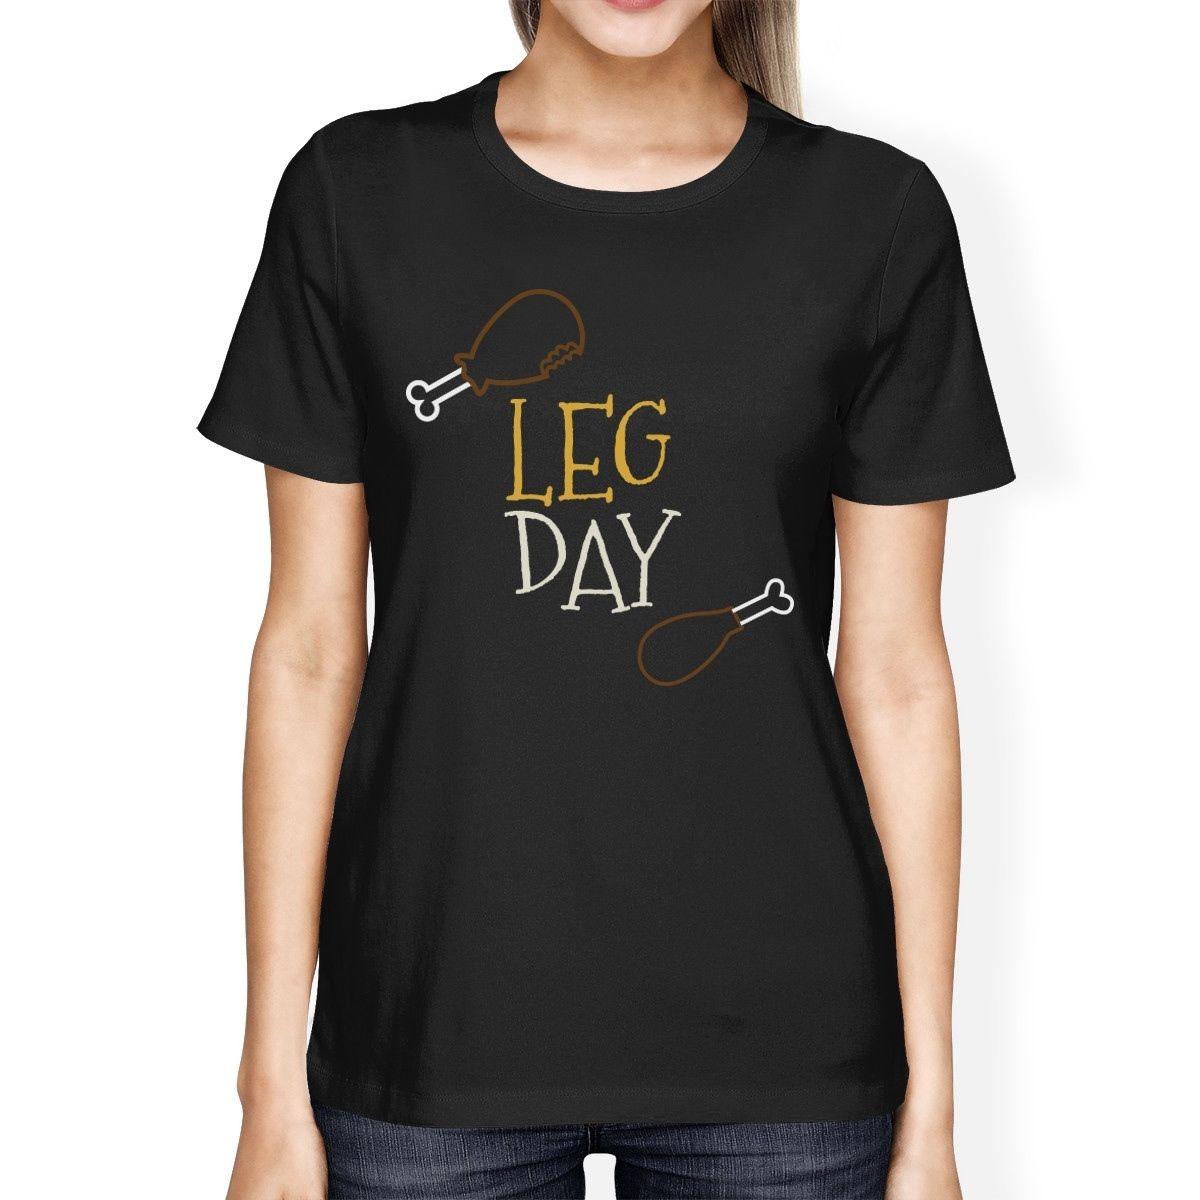 Leg Day Womens T-shirt Work Out Cute Graphic Printed Shirt Summer Style T Shirt Women Lovely Style Hot Sale Shirt Brand